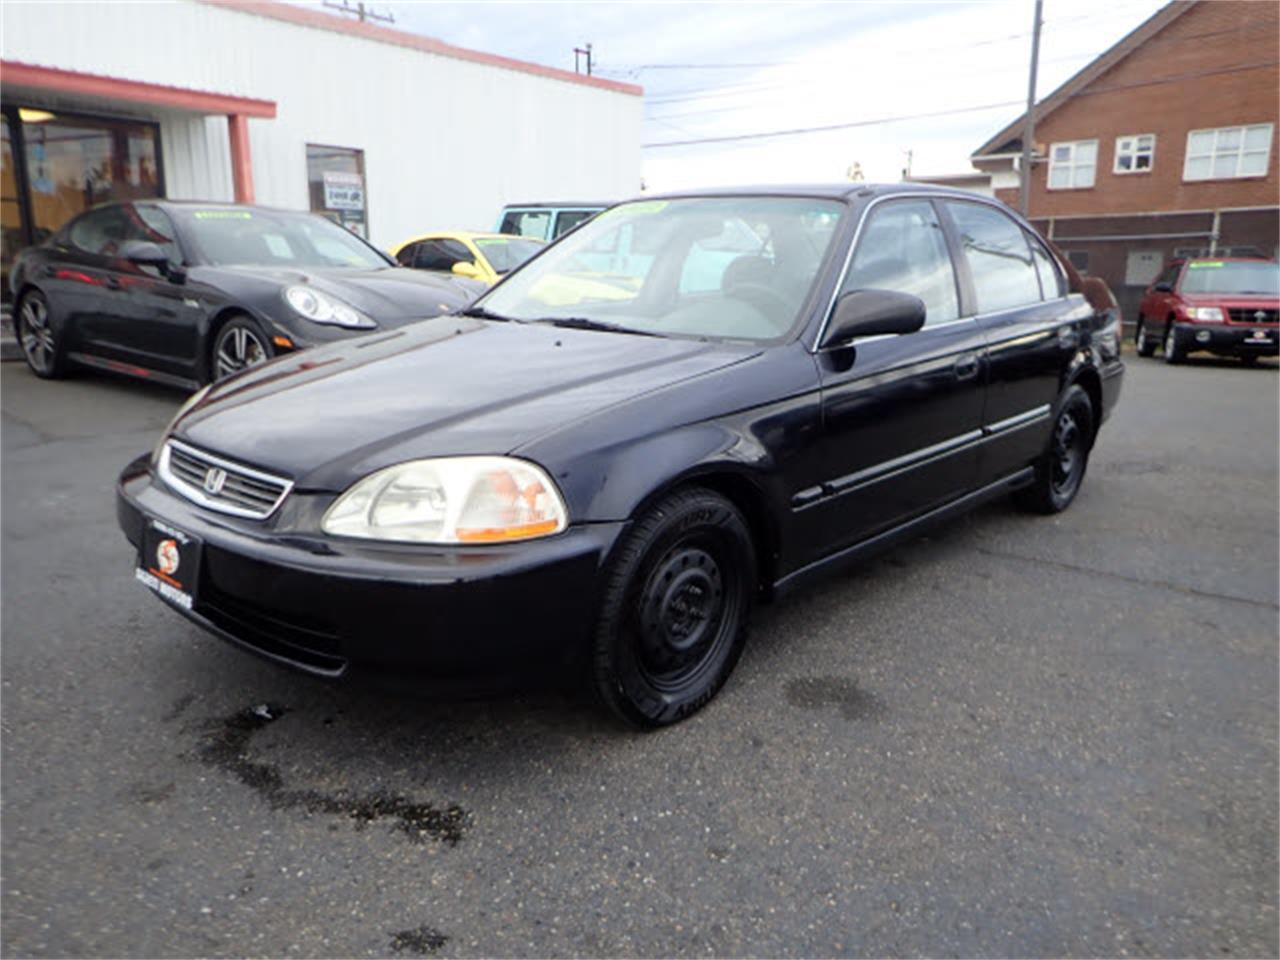 Civic Classic Sedan Black Olx: 1996 Honda Civic For Sale